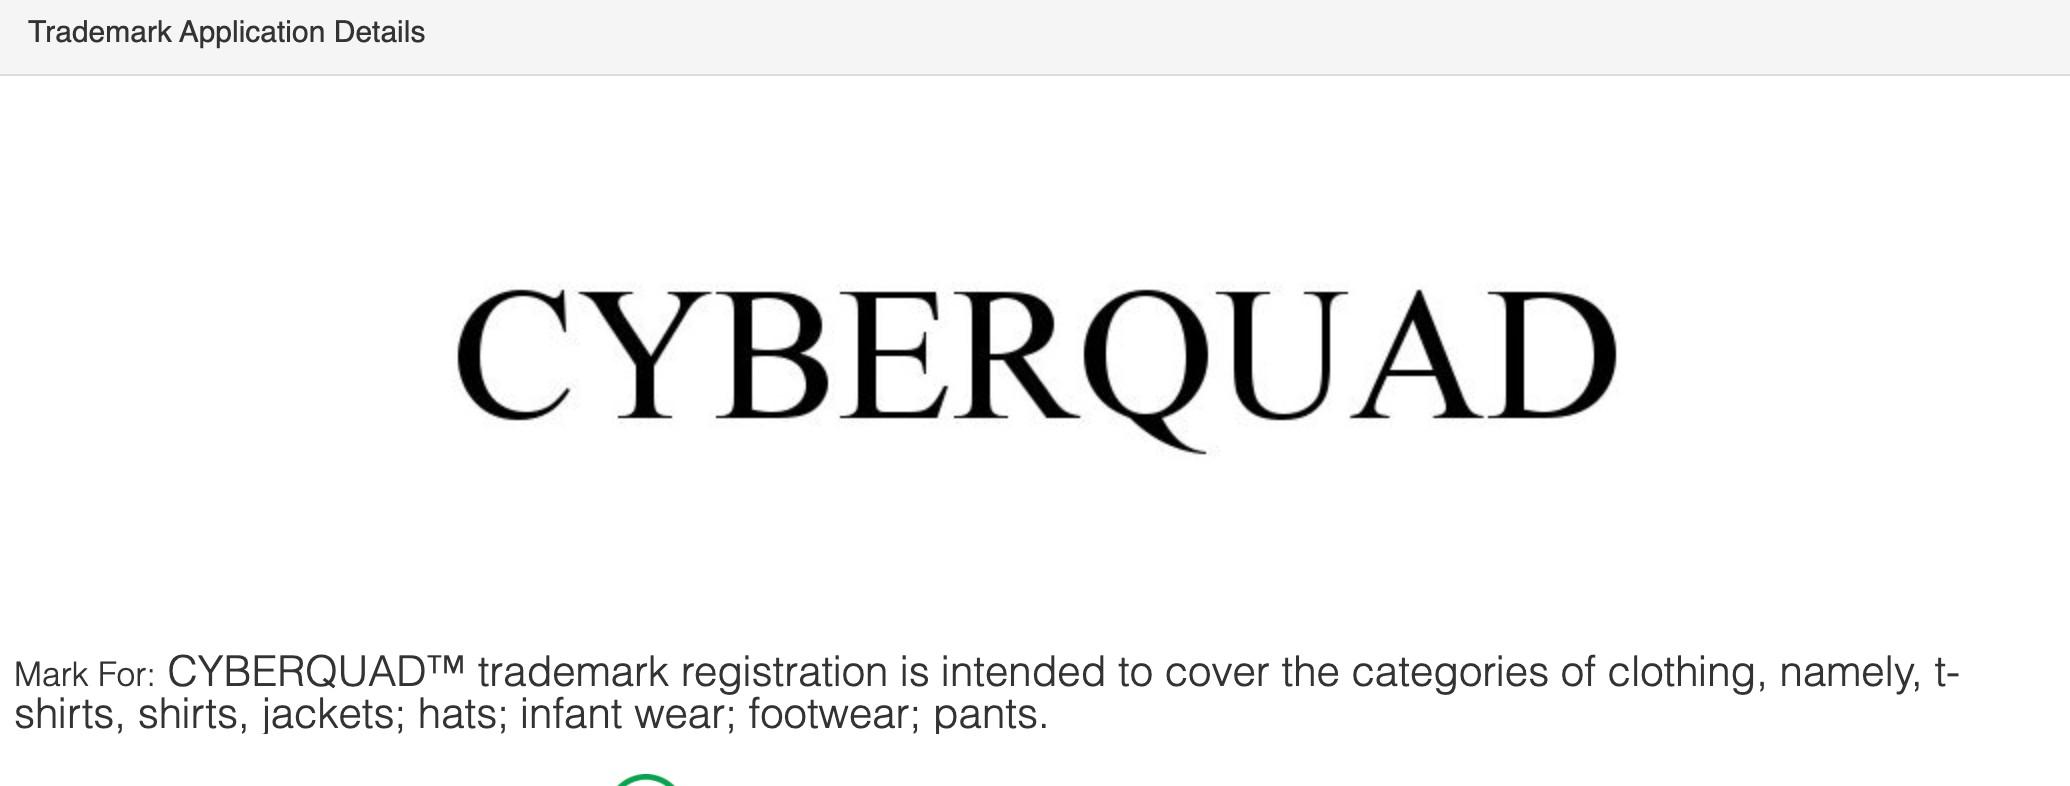 tesla-cyberquad-trademark-clothing-registration